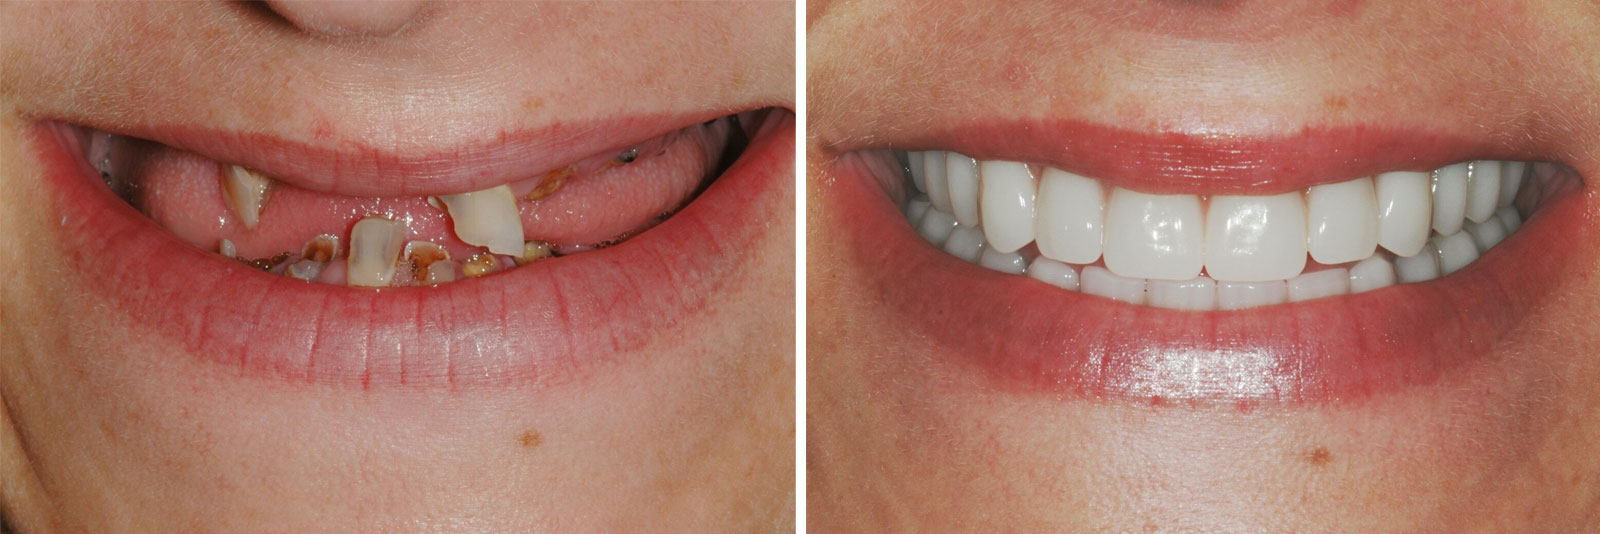 Tooth Repairing